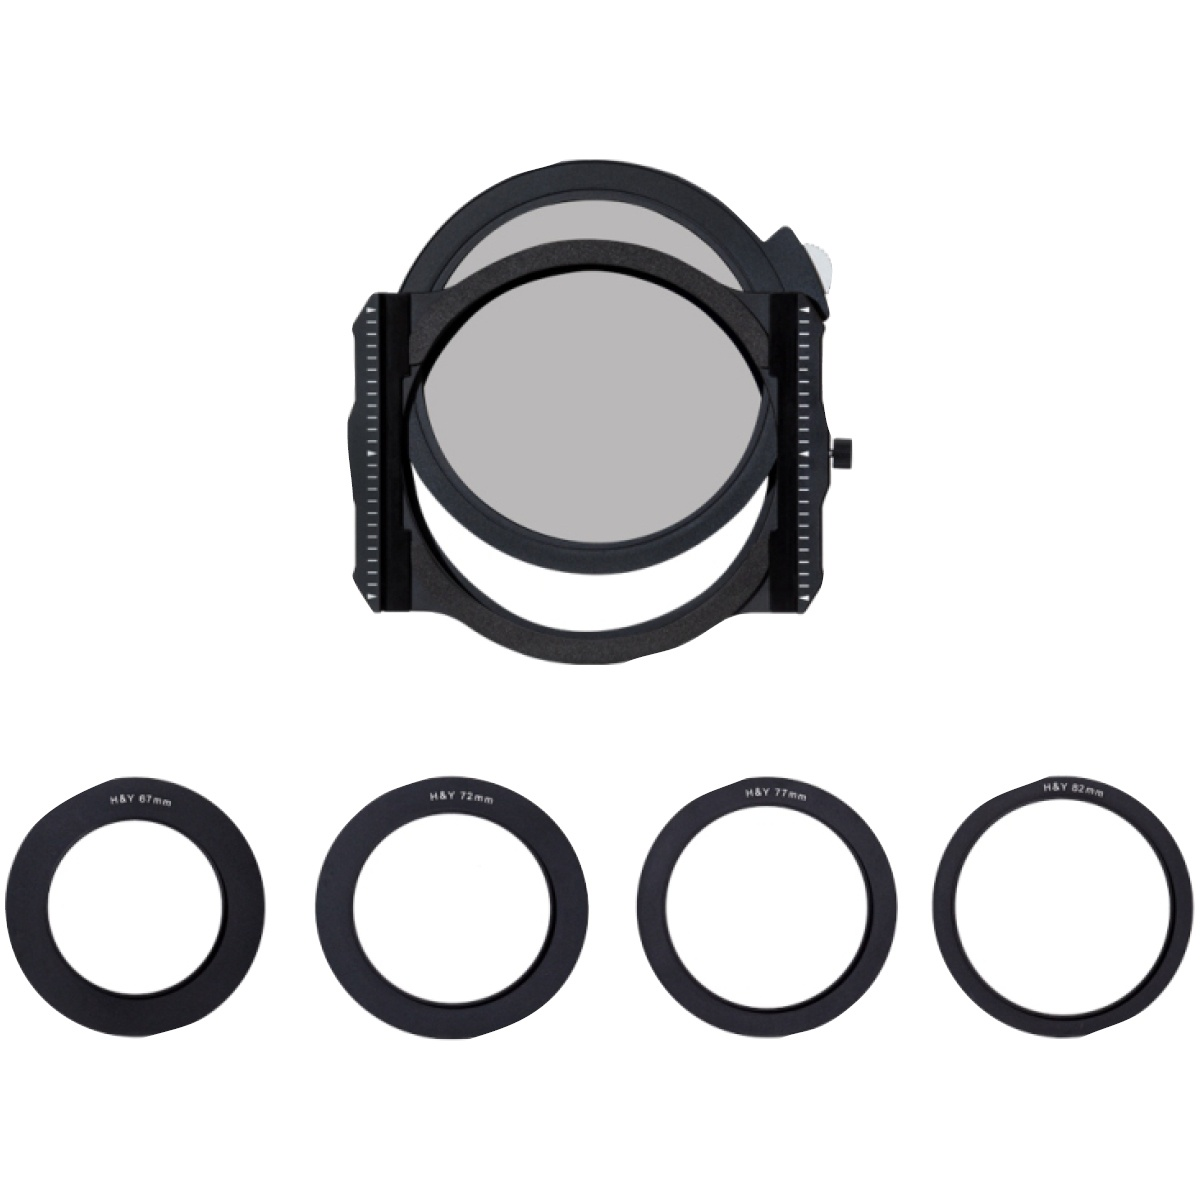 H&Y Filterhalter K-Serie mit Polarisationsfilter 95 mm